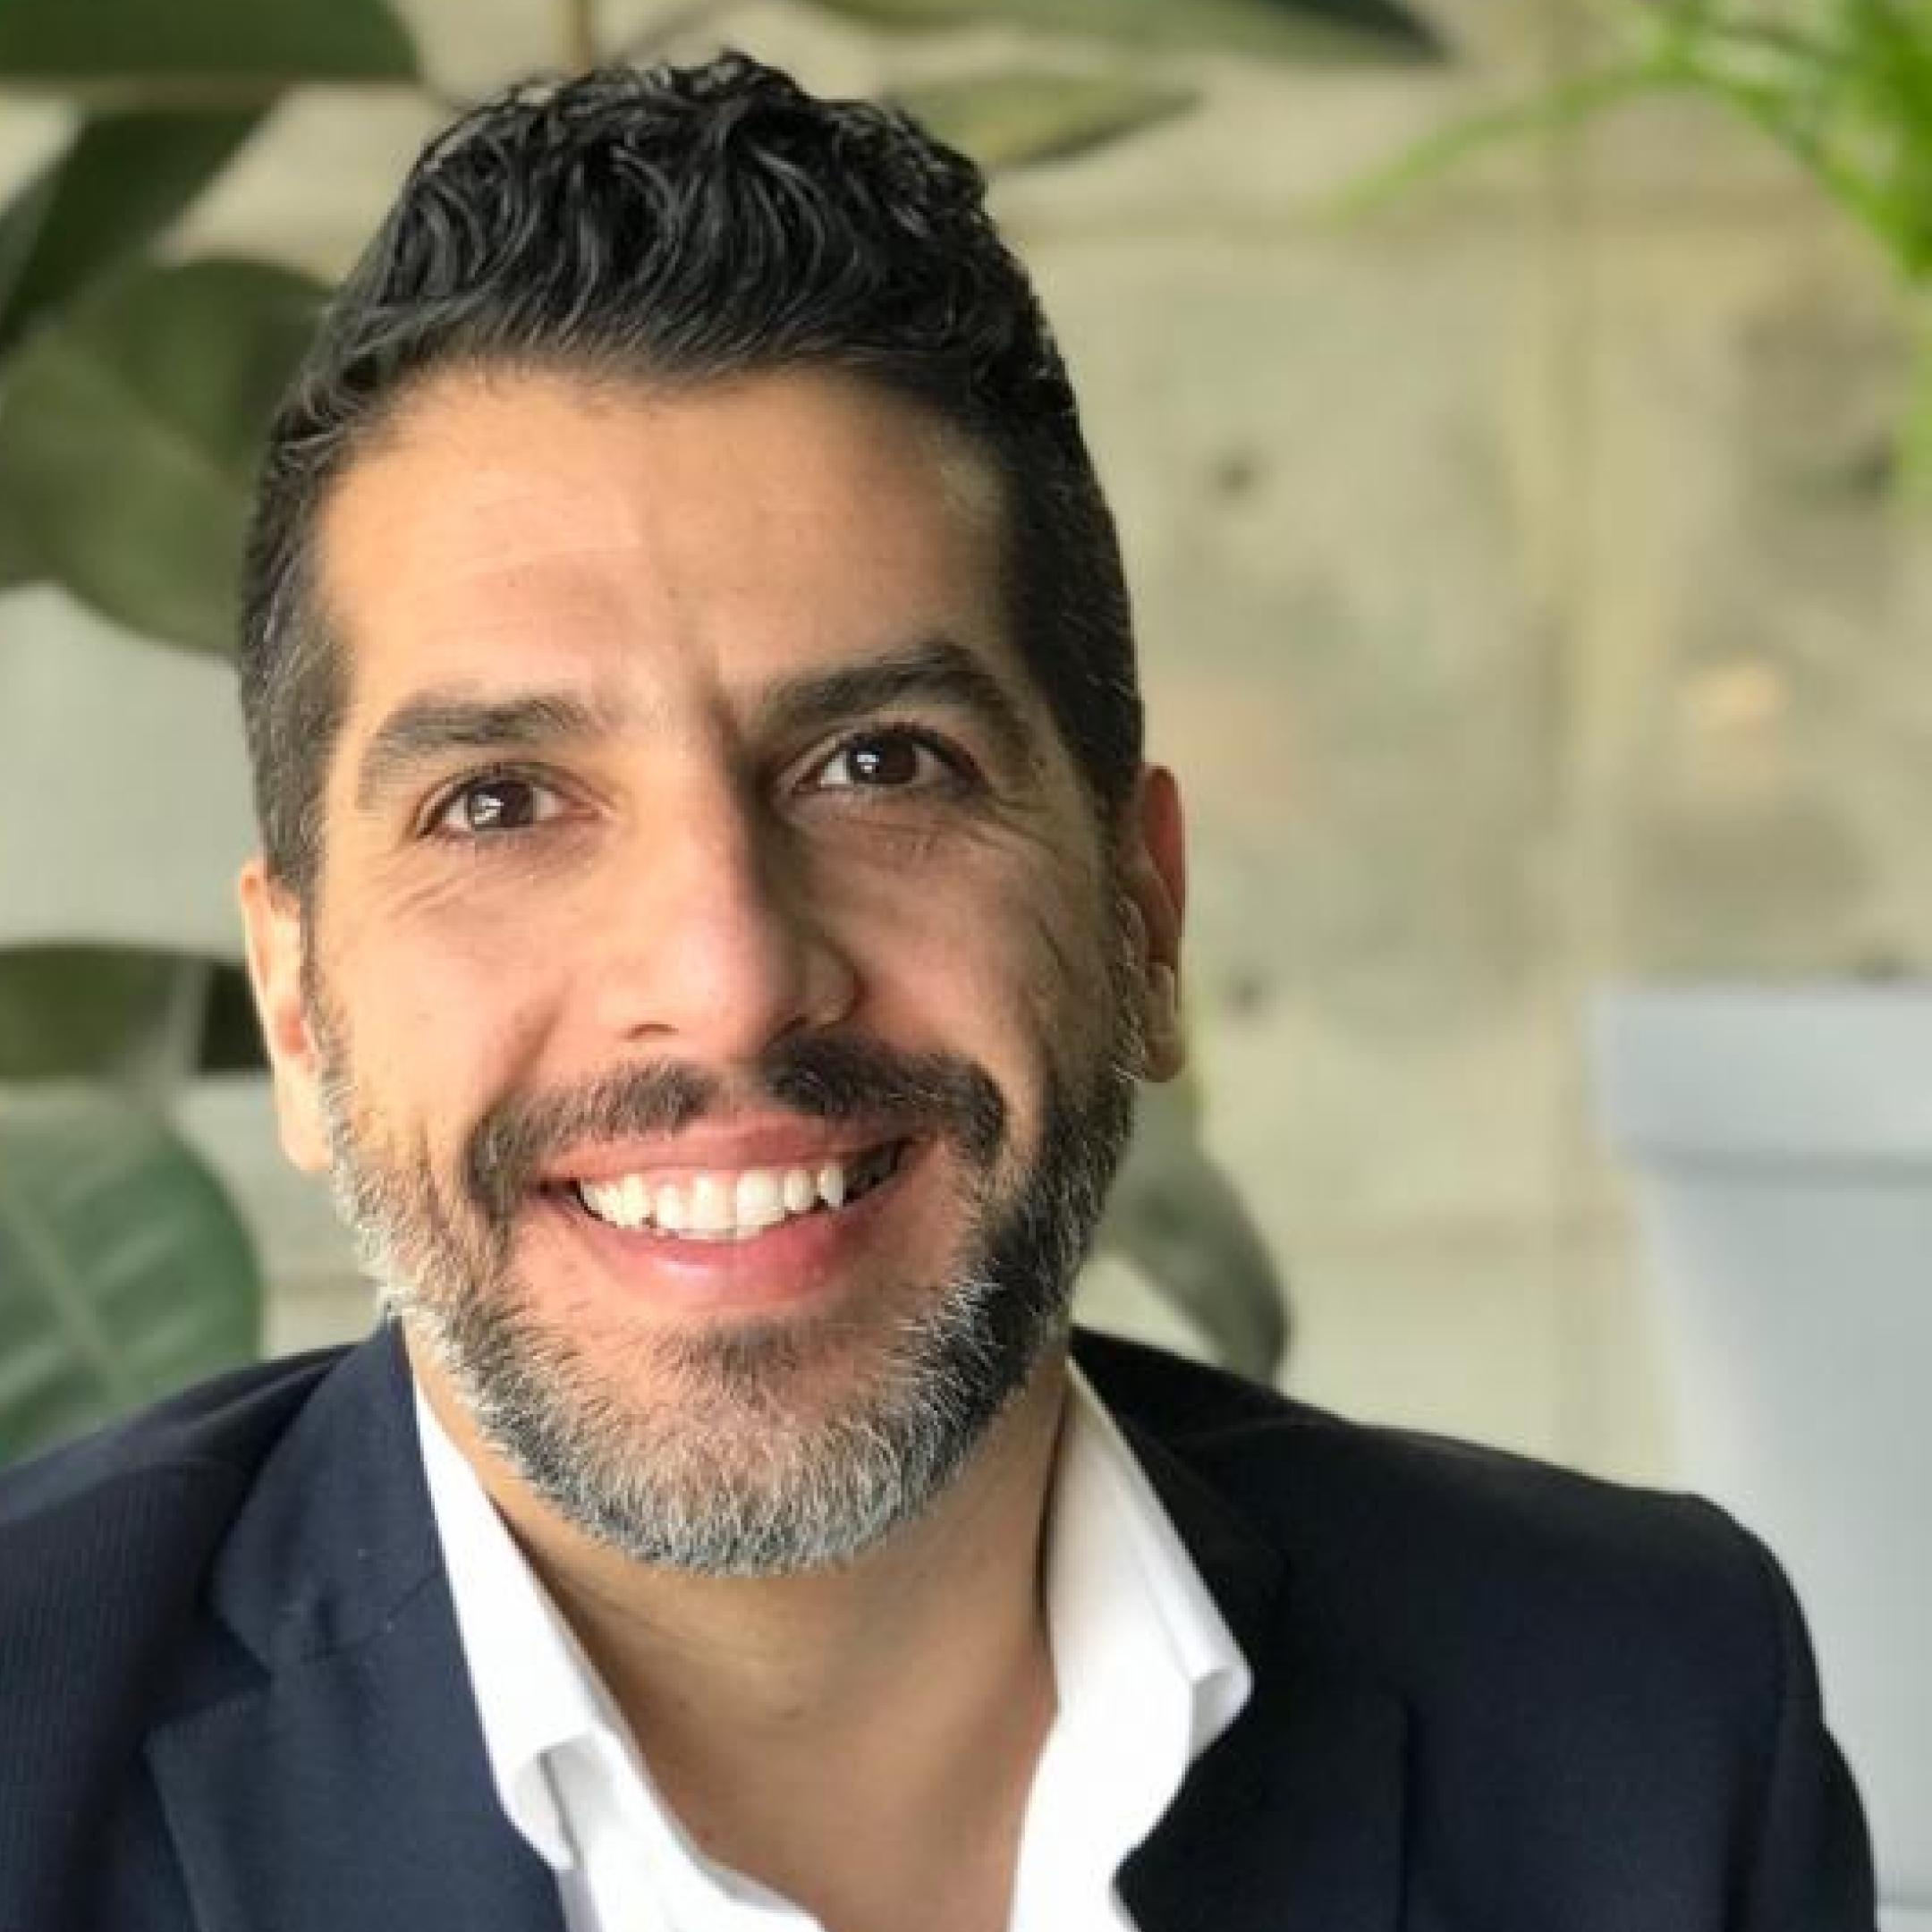 Arash Nourkeyhani